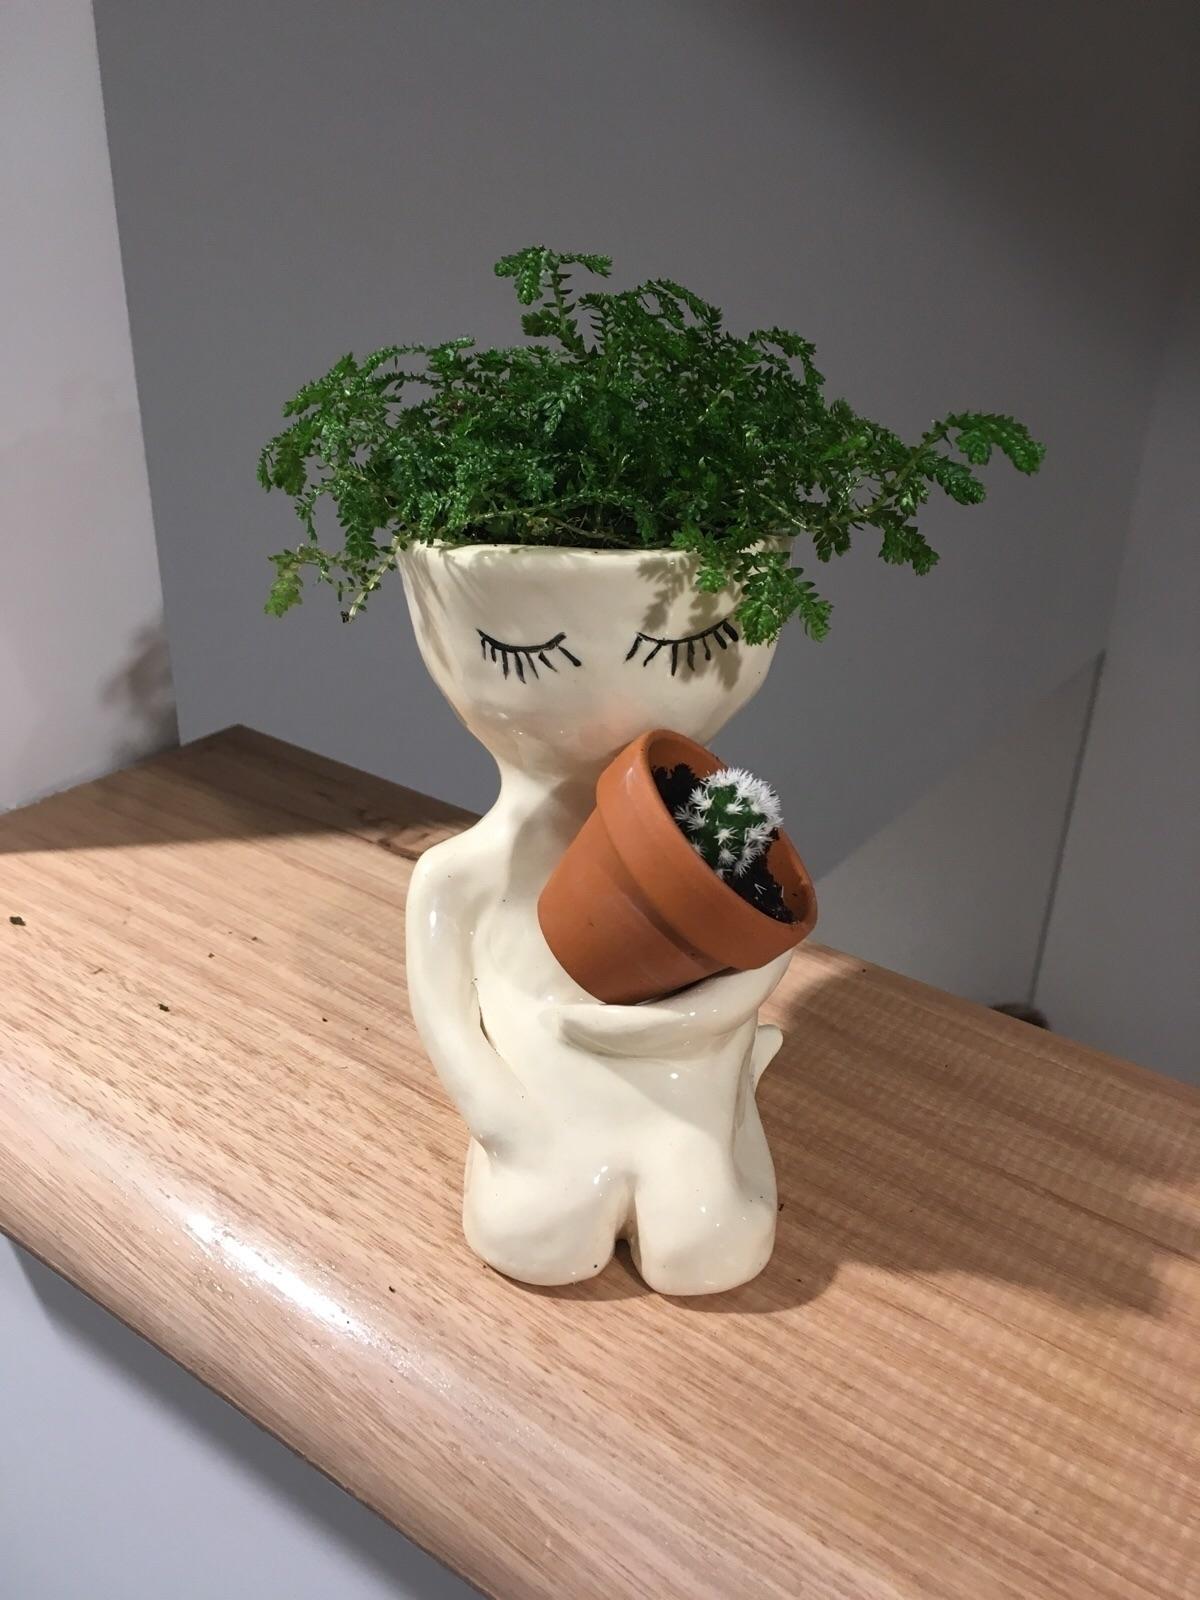 dude pot finished ready home - pot#pottery#ceramics#plants#cactus - livingdecortwins | ello